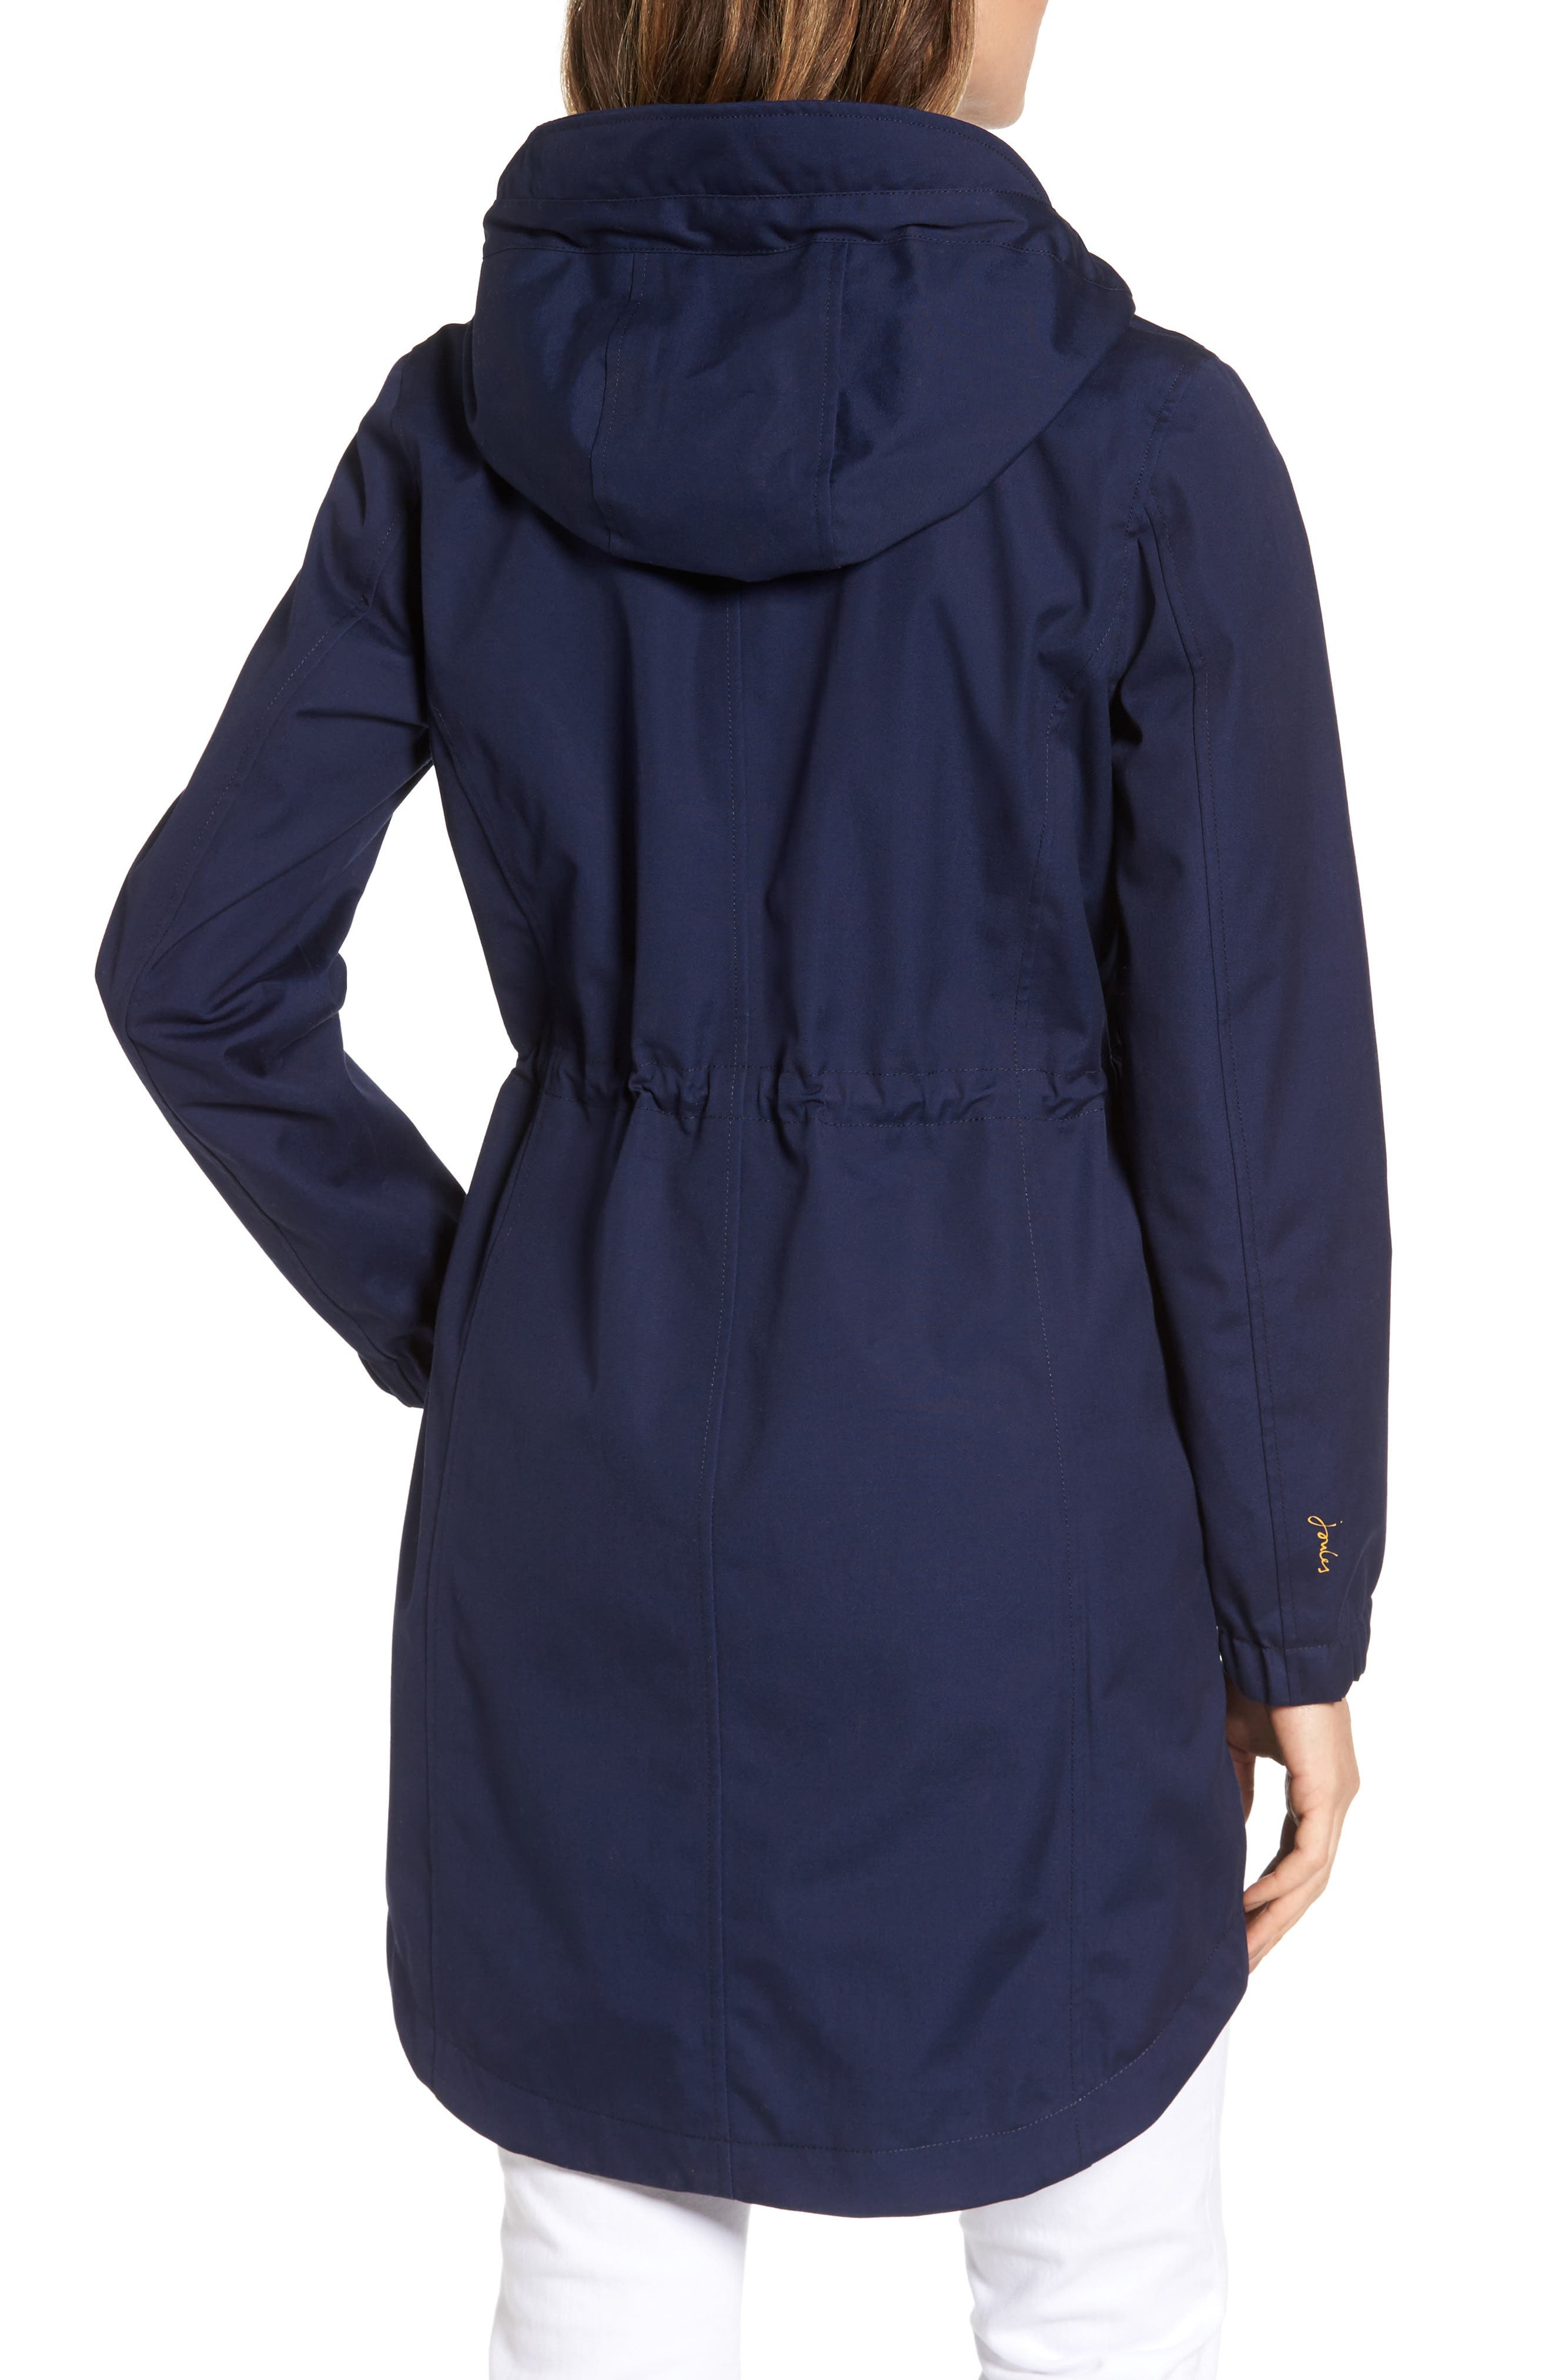 Right as Rain Waterproof Hooded Jacket,                             Alternate thumbnail 2, color,                             411